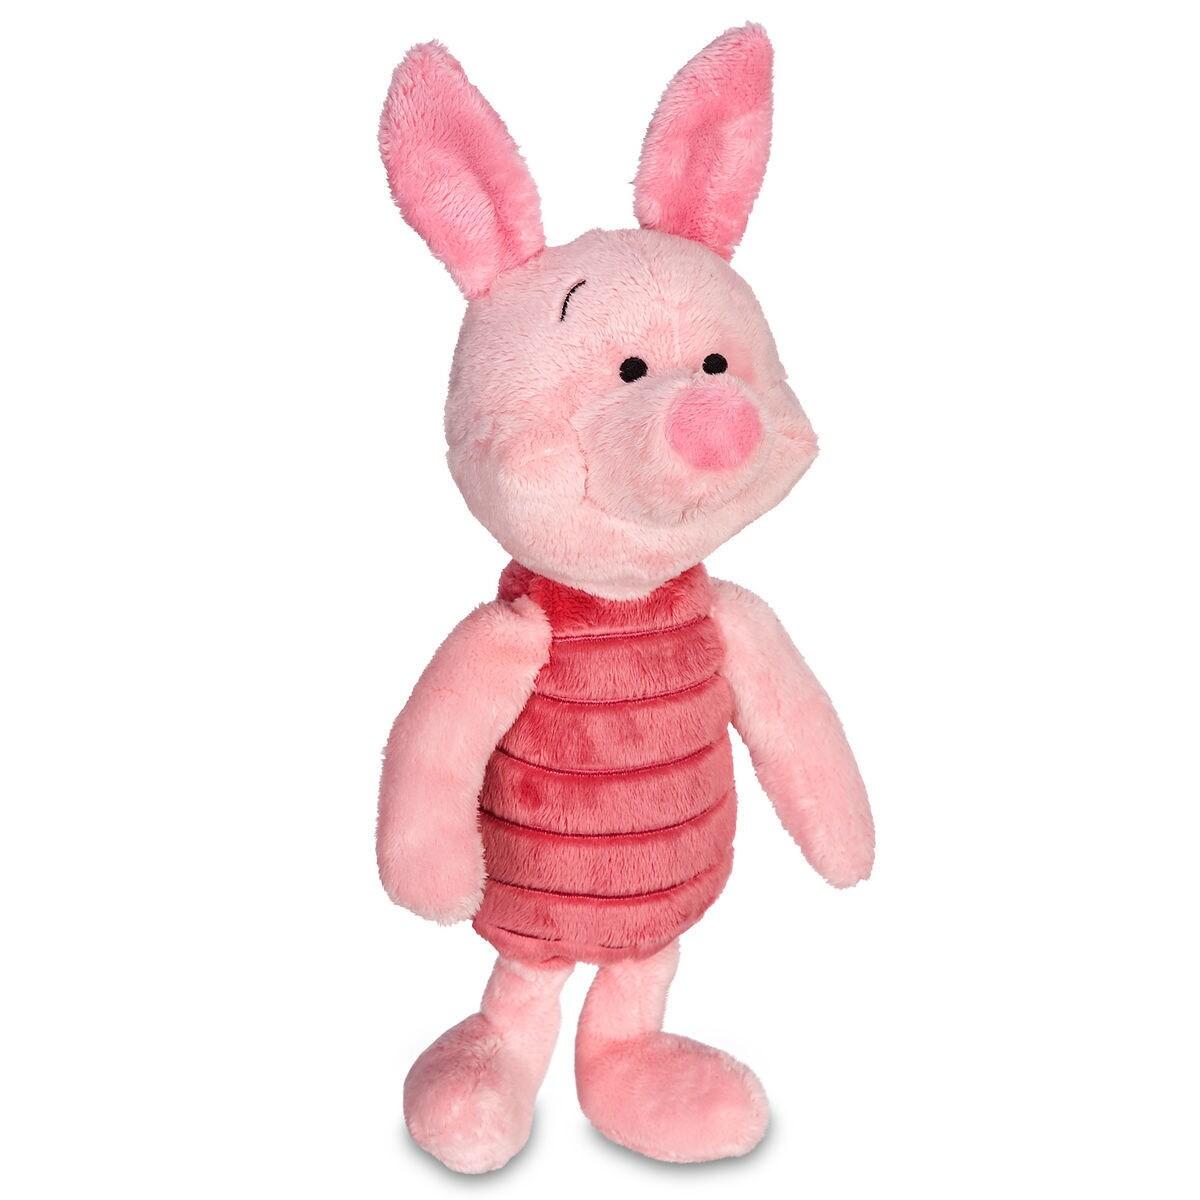 piglet plush winnie the pooh small 11 shopdisney